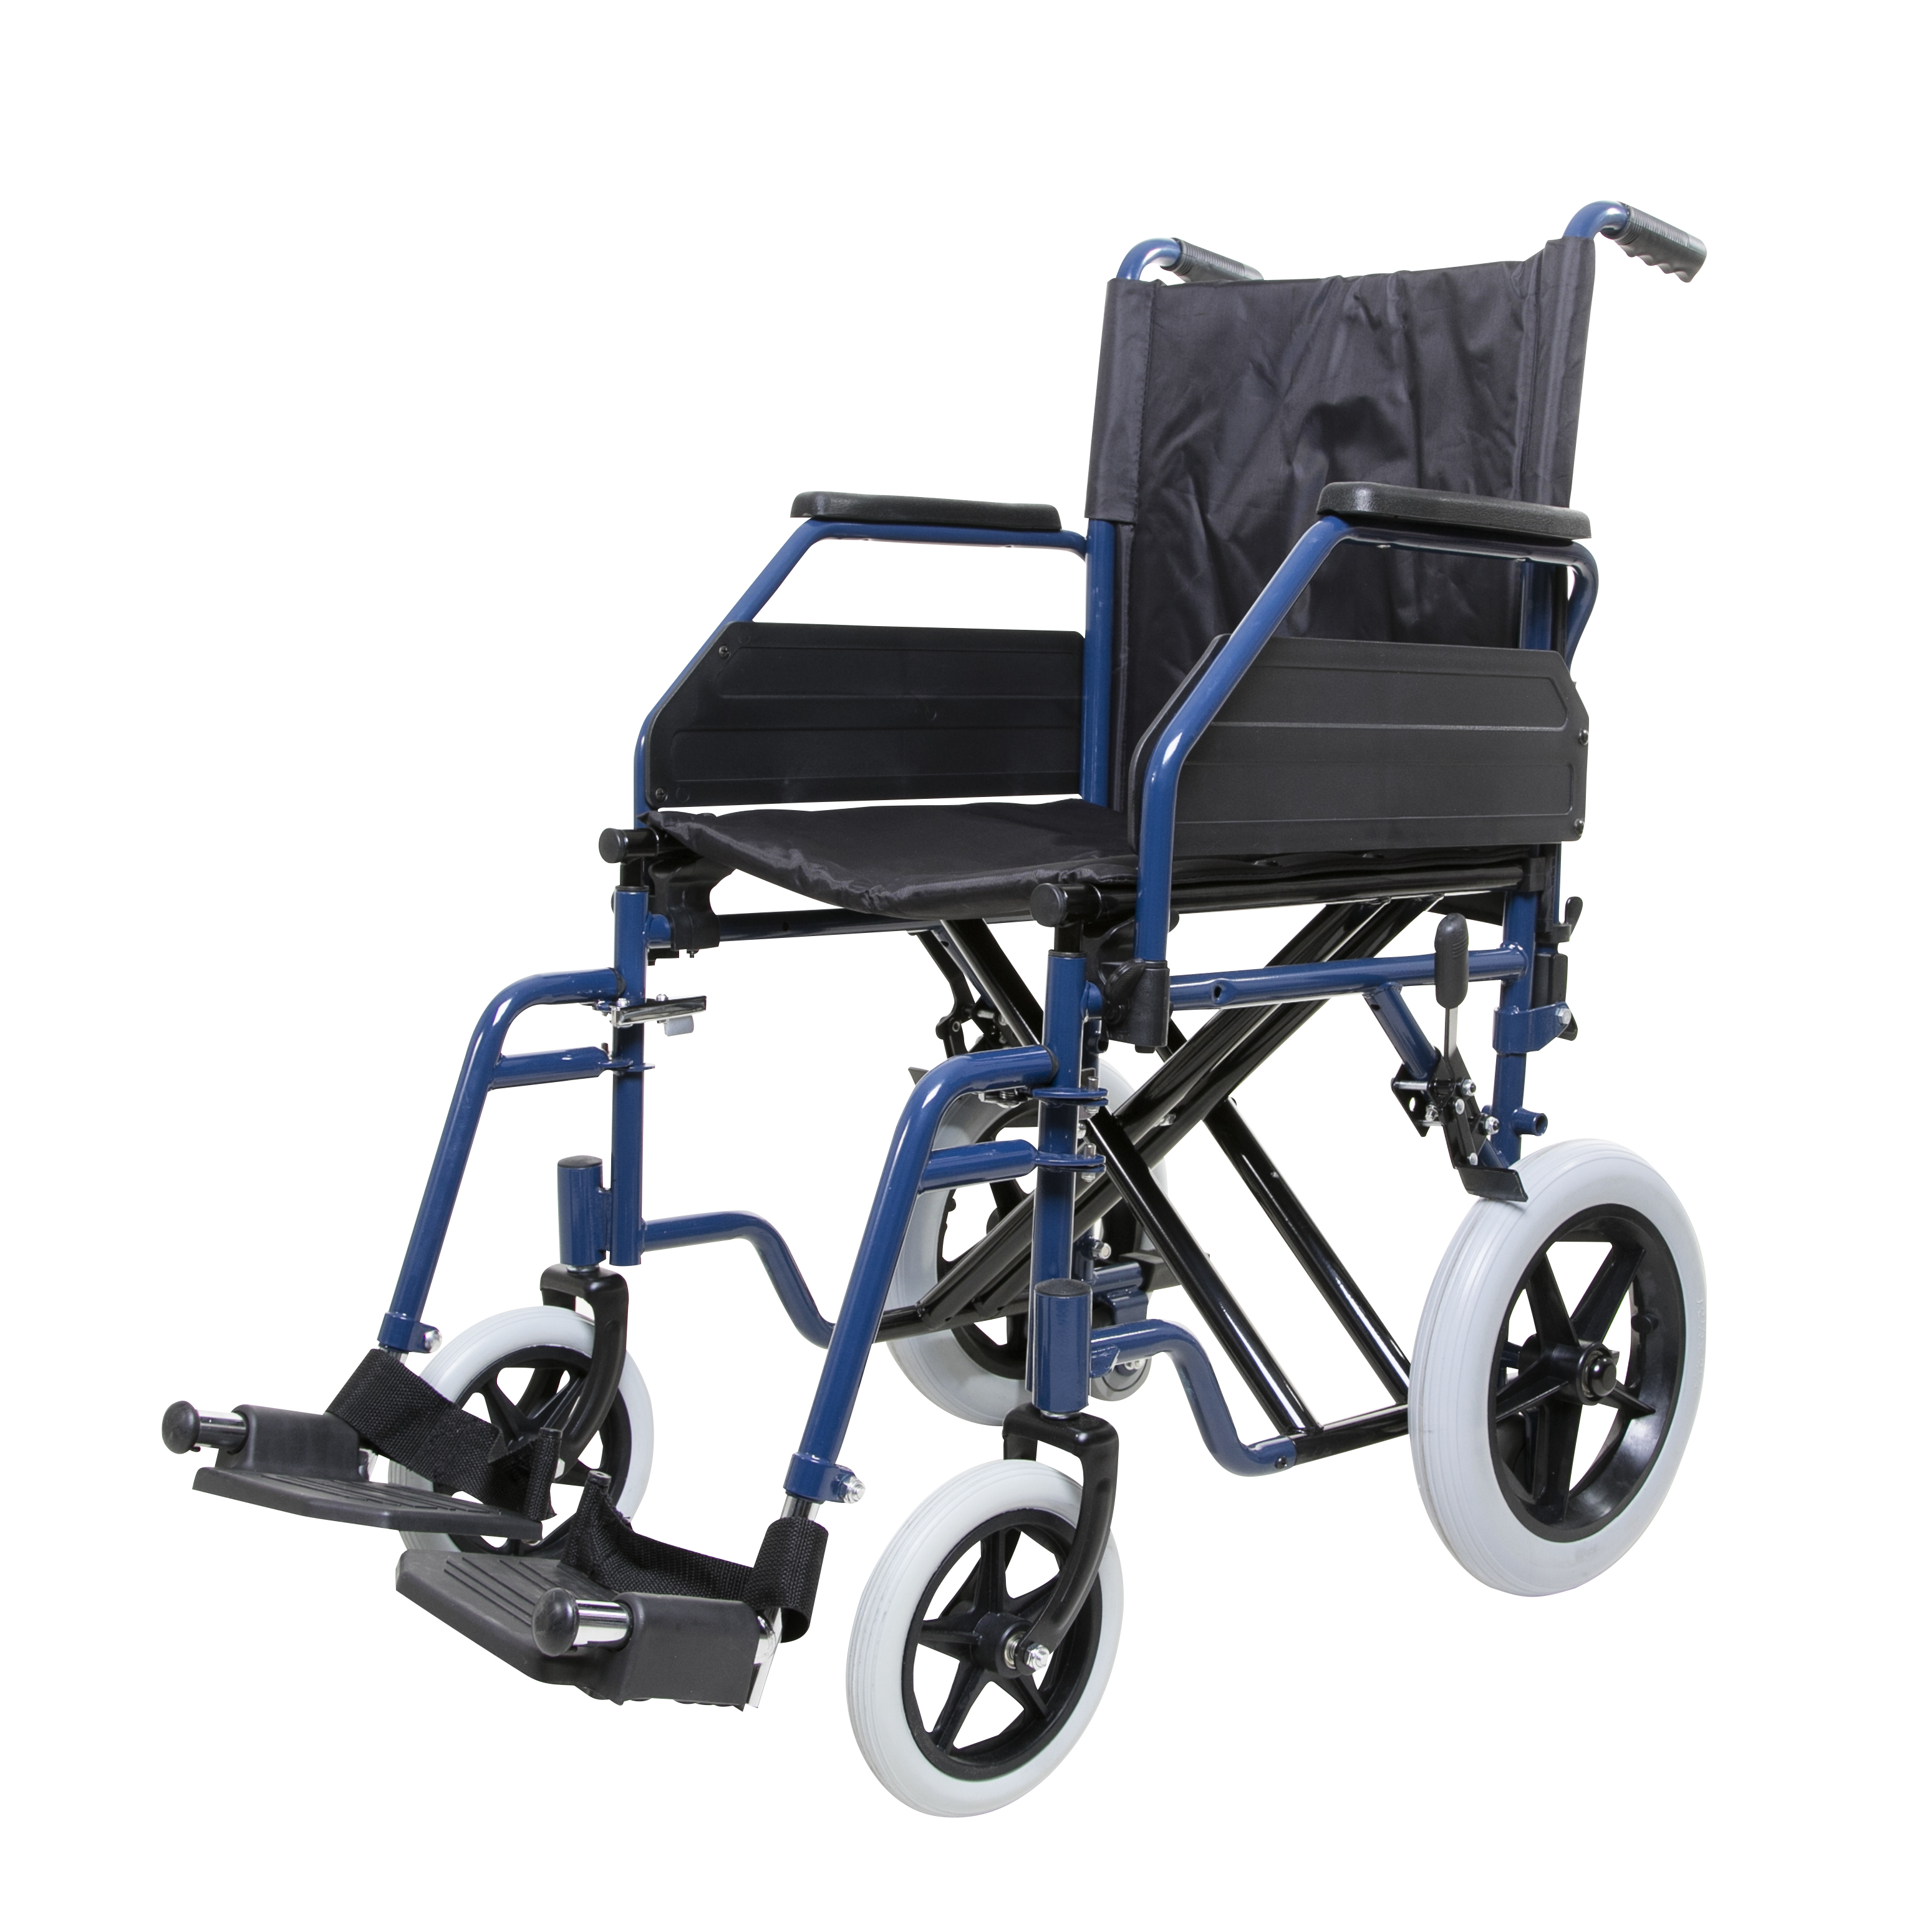 Able2 Transportstoel